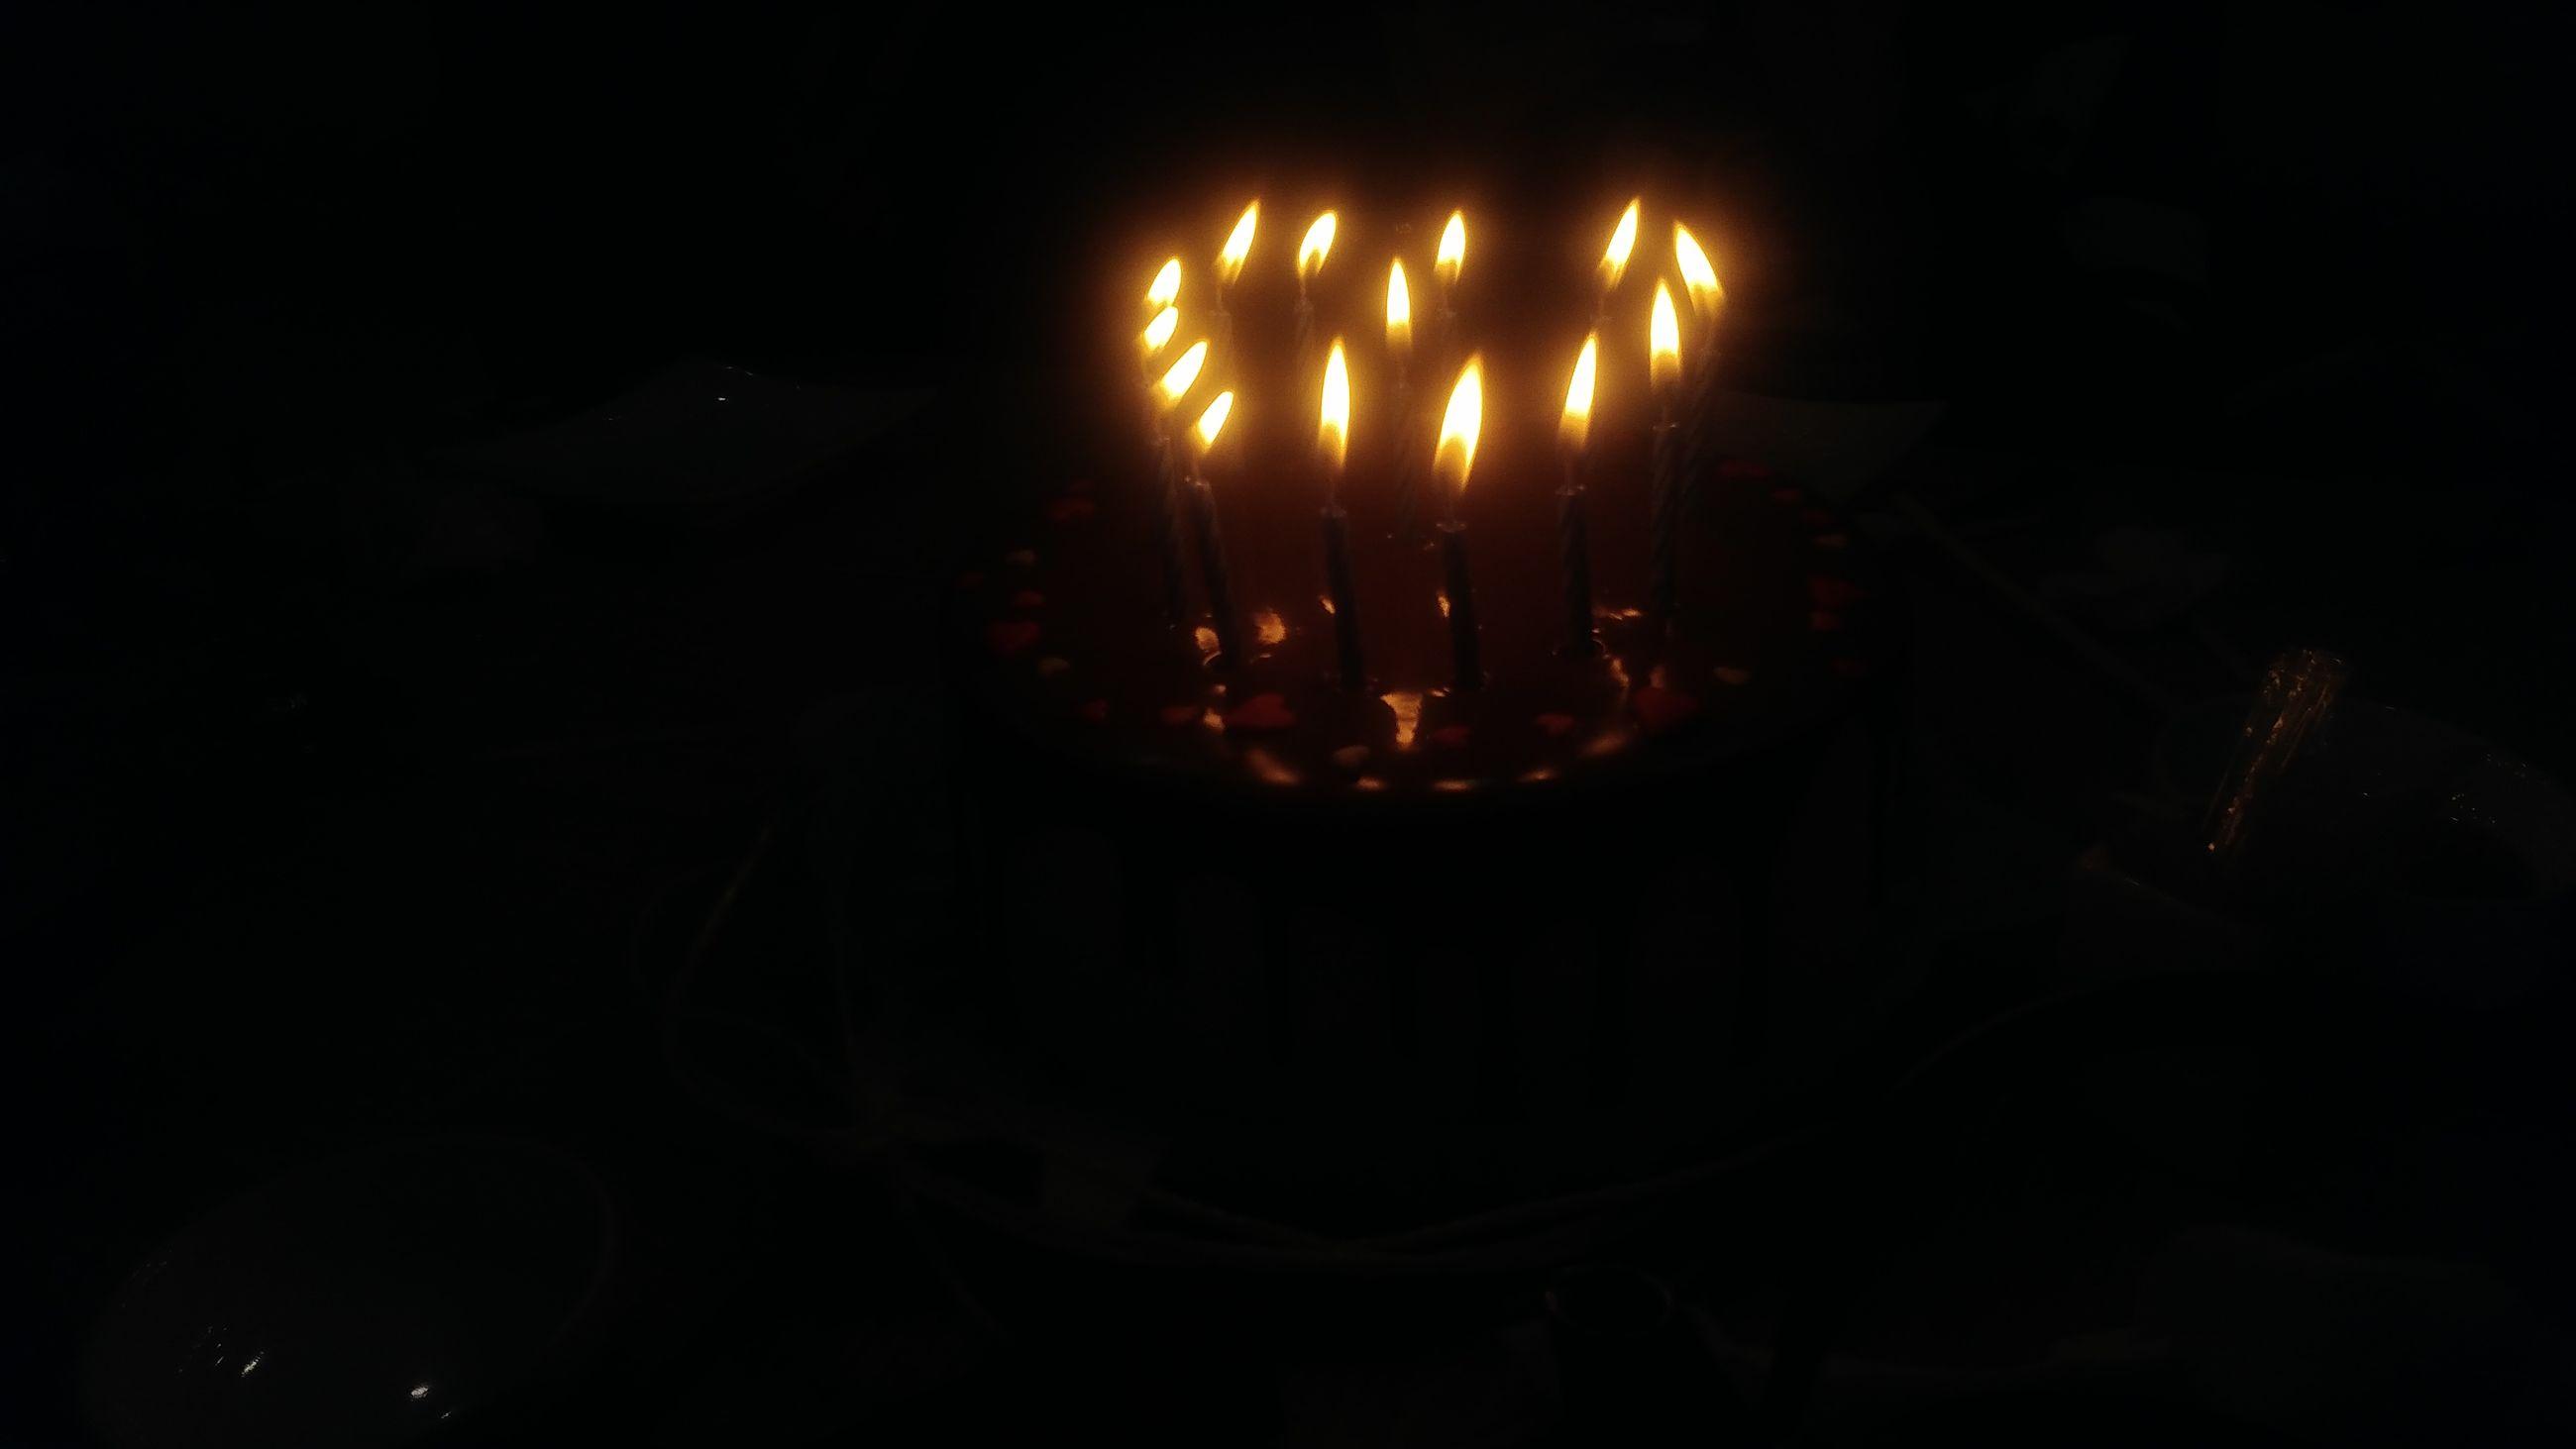 flame, burning, glowing, candle, heat - temperature, lit, celebration, religion, tradition, illuminated, no people, indoors, spirituality, diwali, hope, oil lamp, night, close-up, diya - oil lamp, tea light